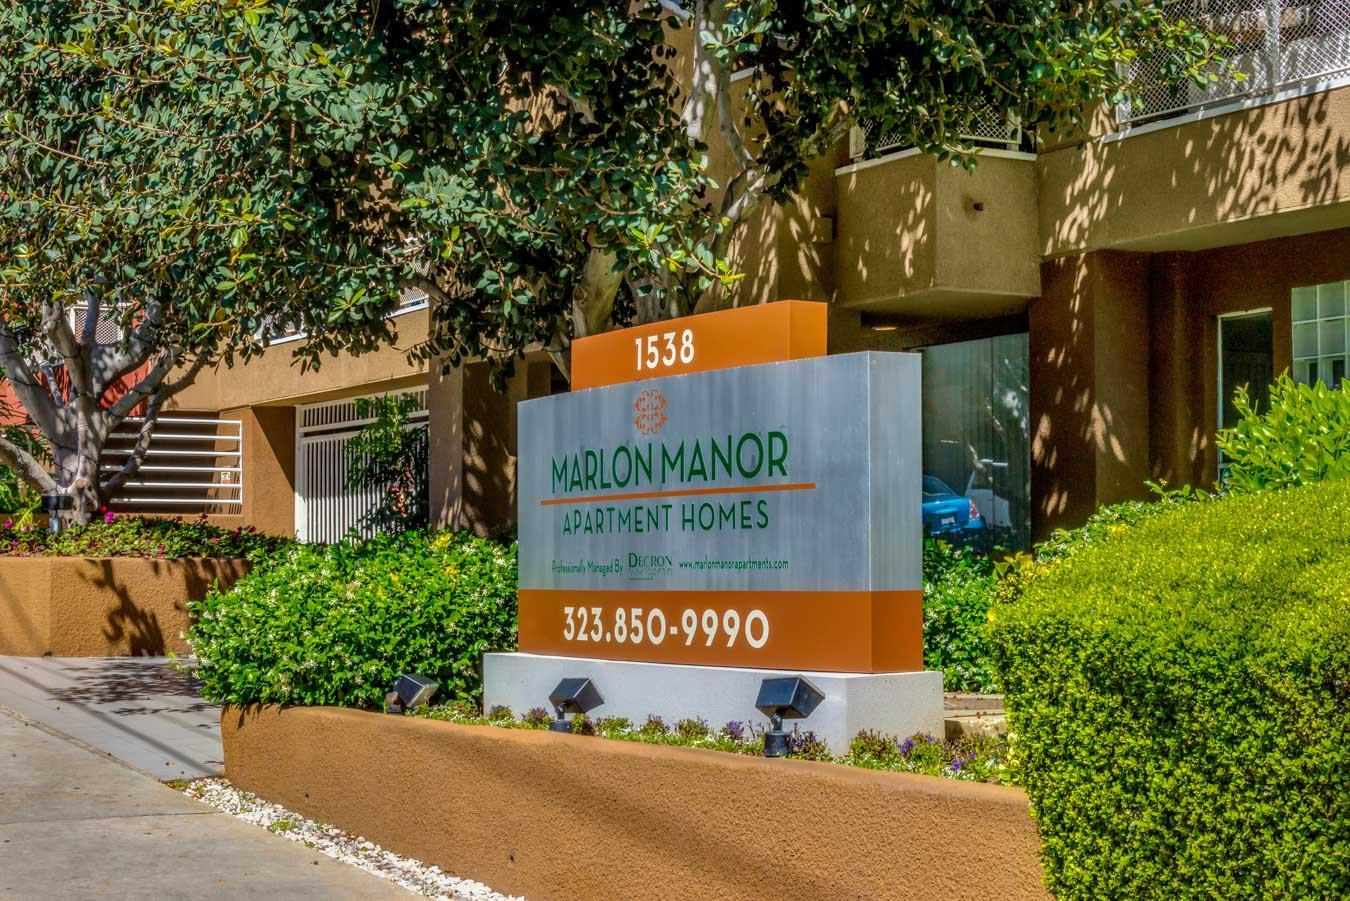 Apartments Near Los Angeles Marlon Manor for Los Angeles Students in Los Angeles, CA